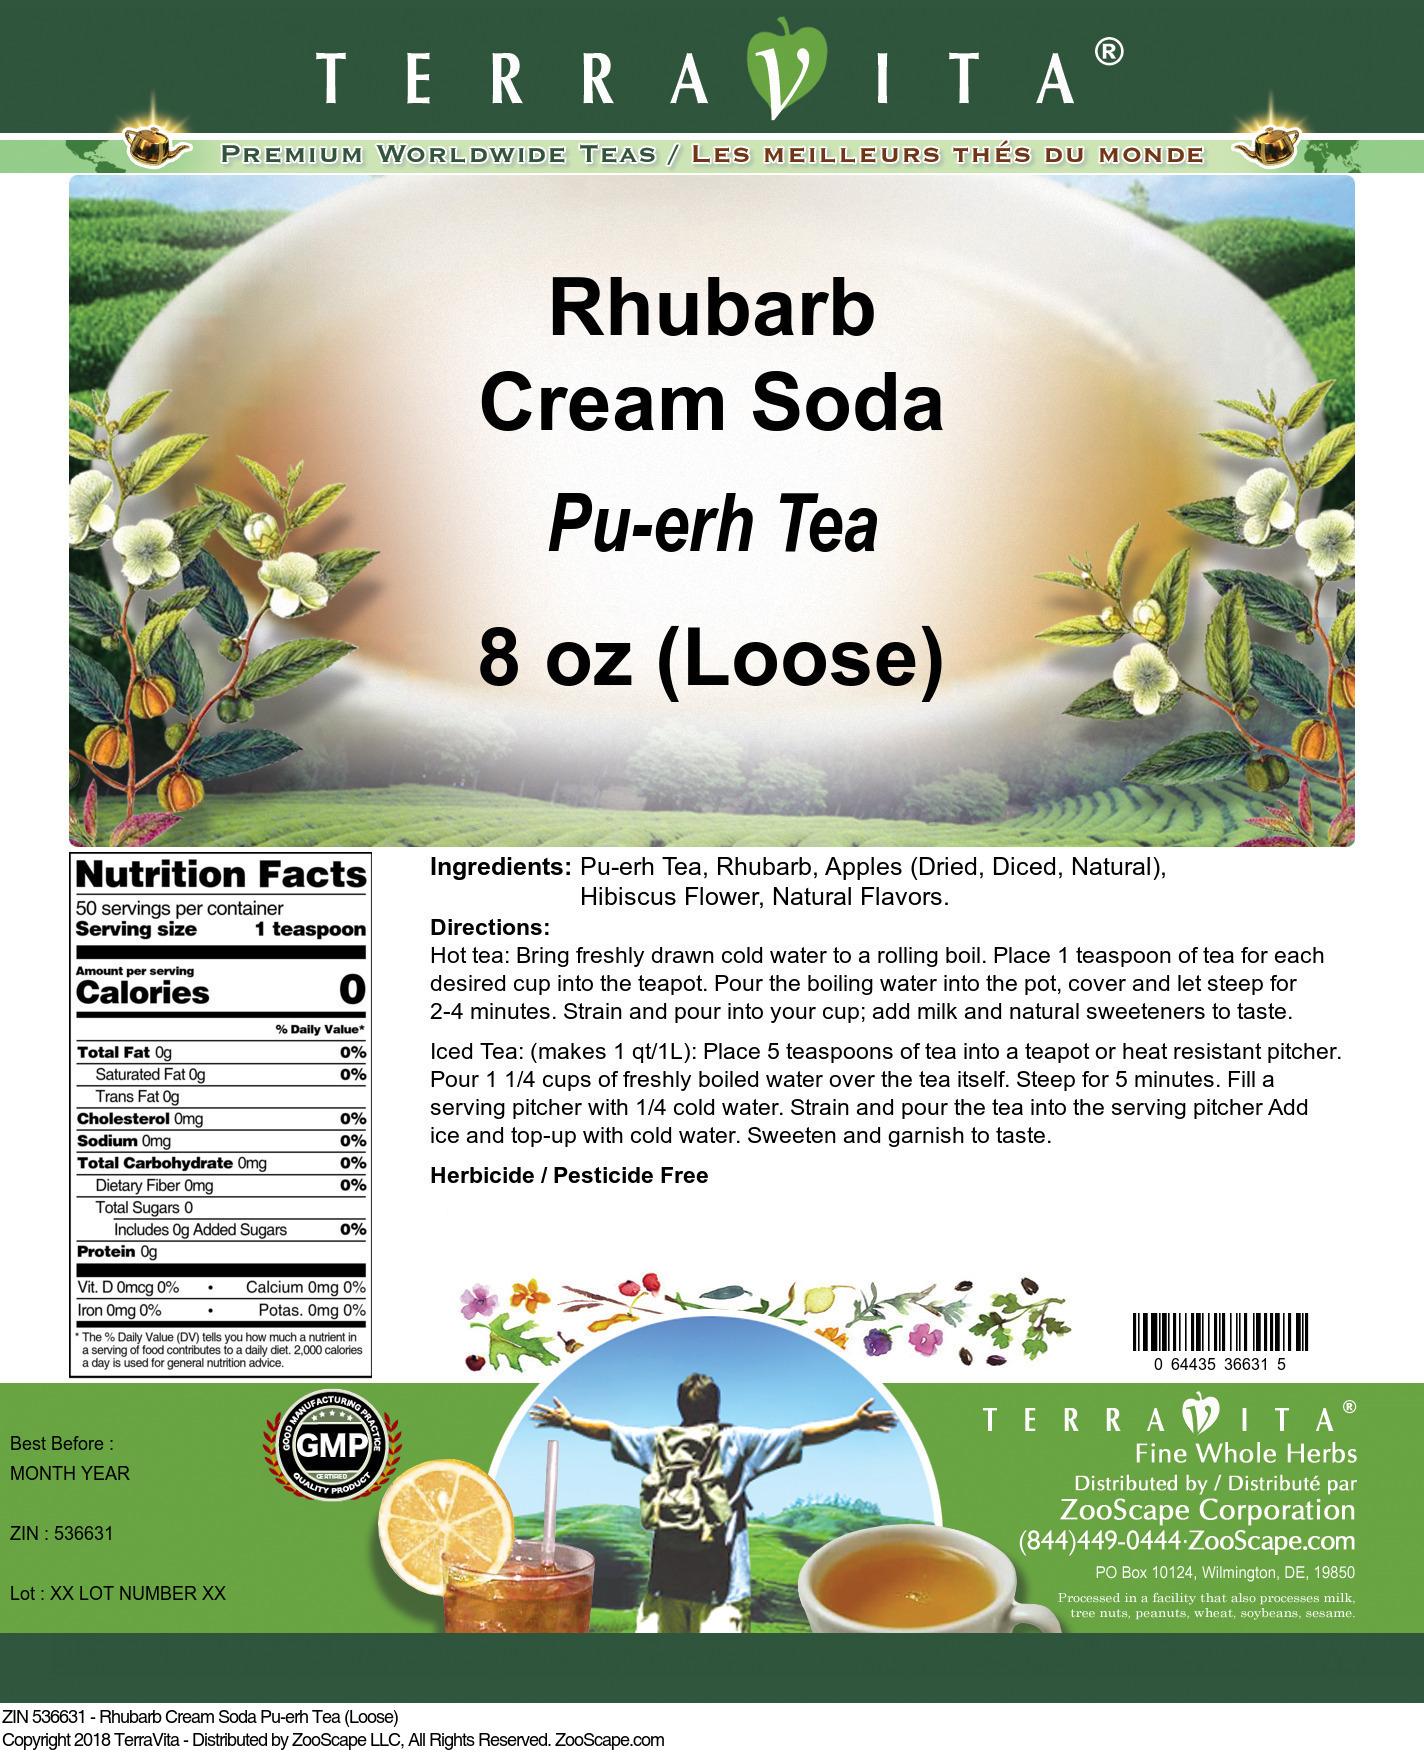 Rhubarb Cream Soda Pu-erh Tea